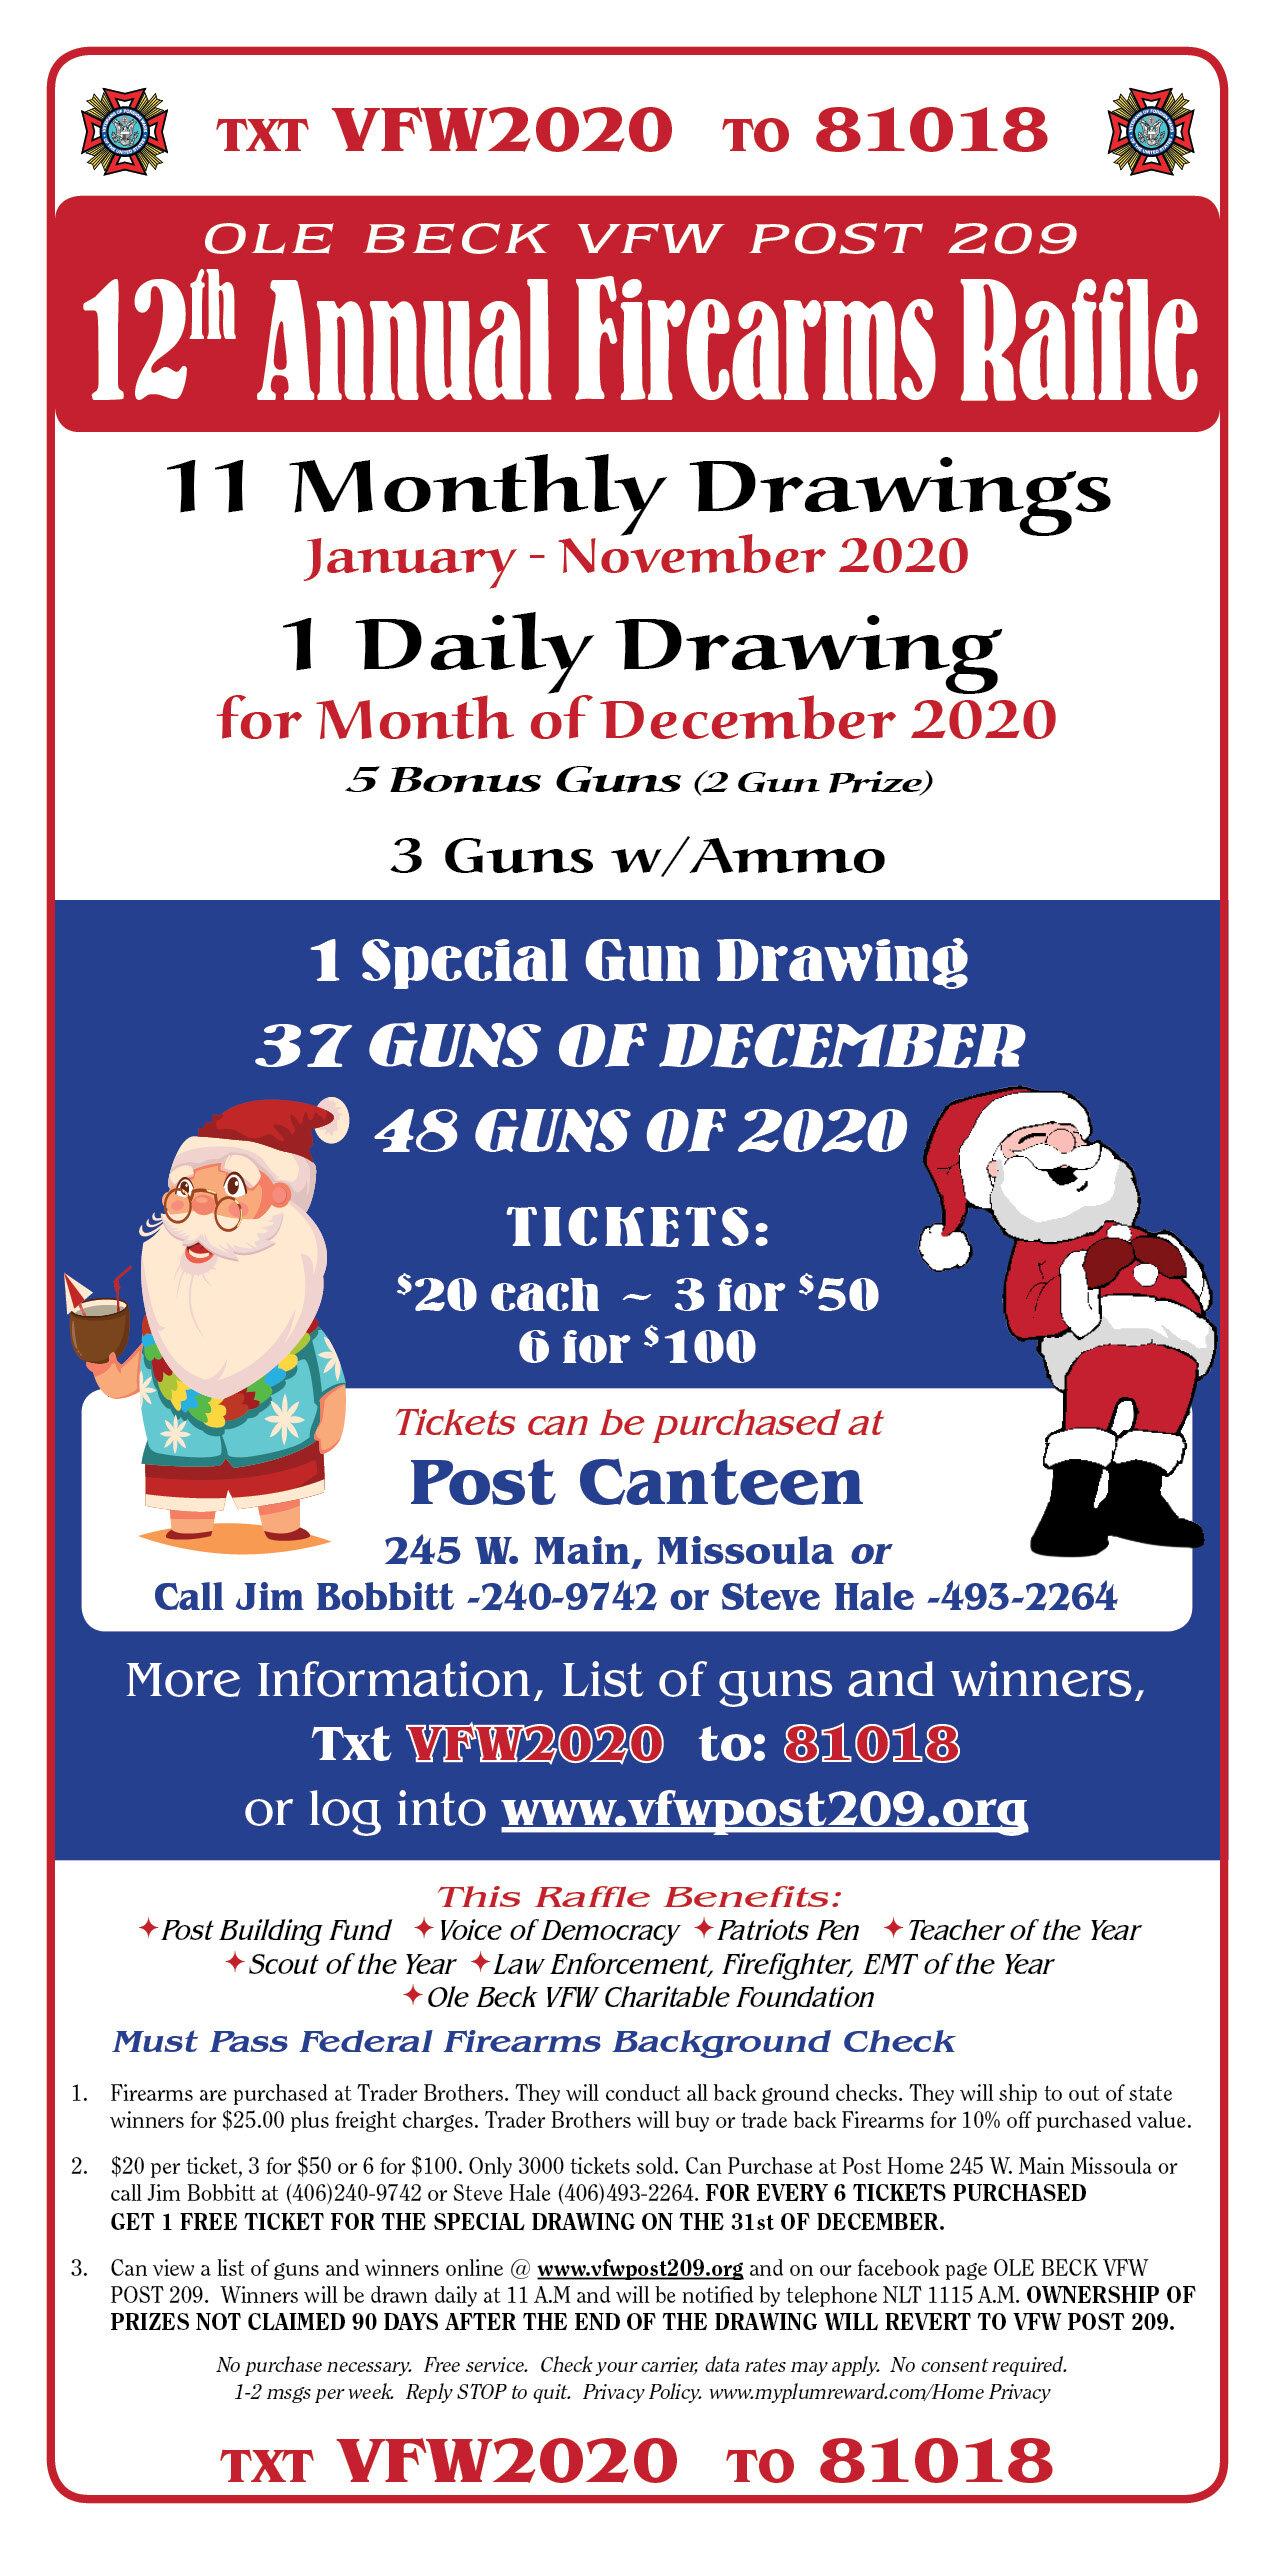 2020 No Christmas Bonus For 2 Years 2020 Annual Firearms Raffle — Ole Beck VFW Post 209